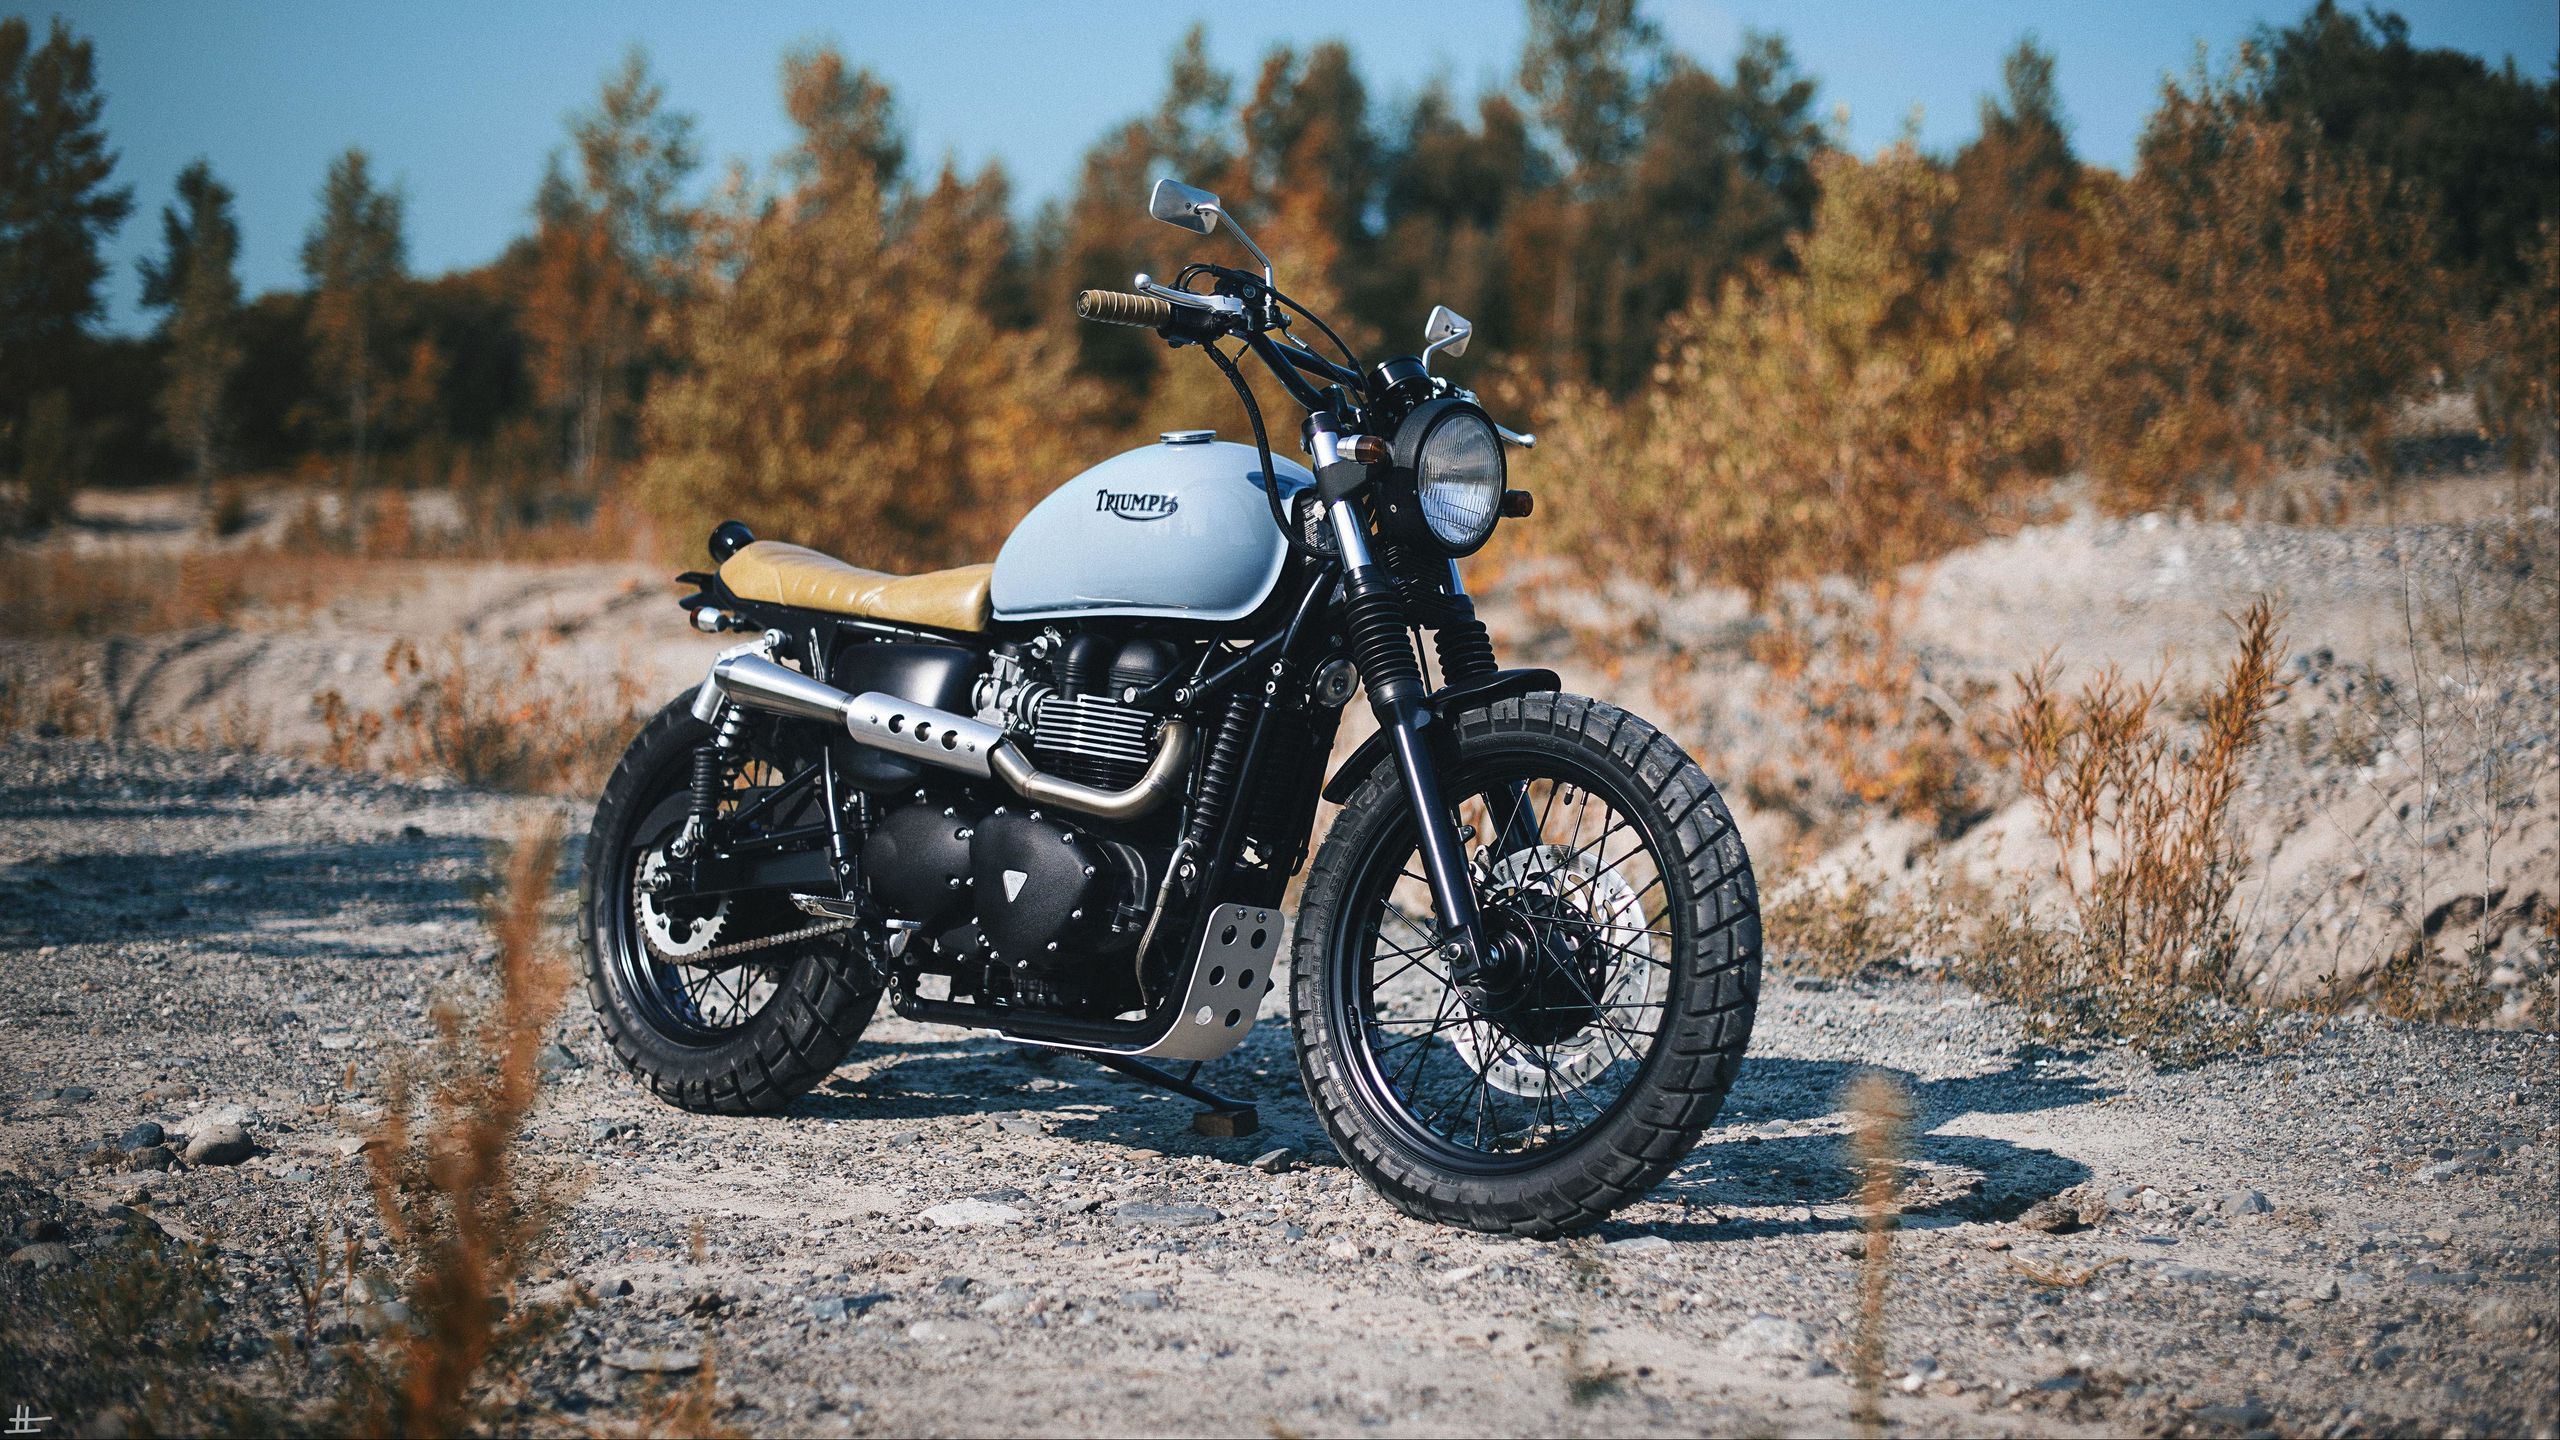 2560x1440 Обои triumph, bonneville, мотоцикл, вид сбоку